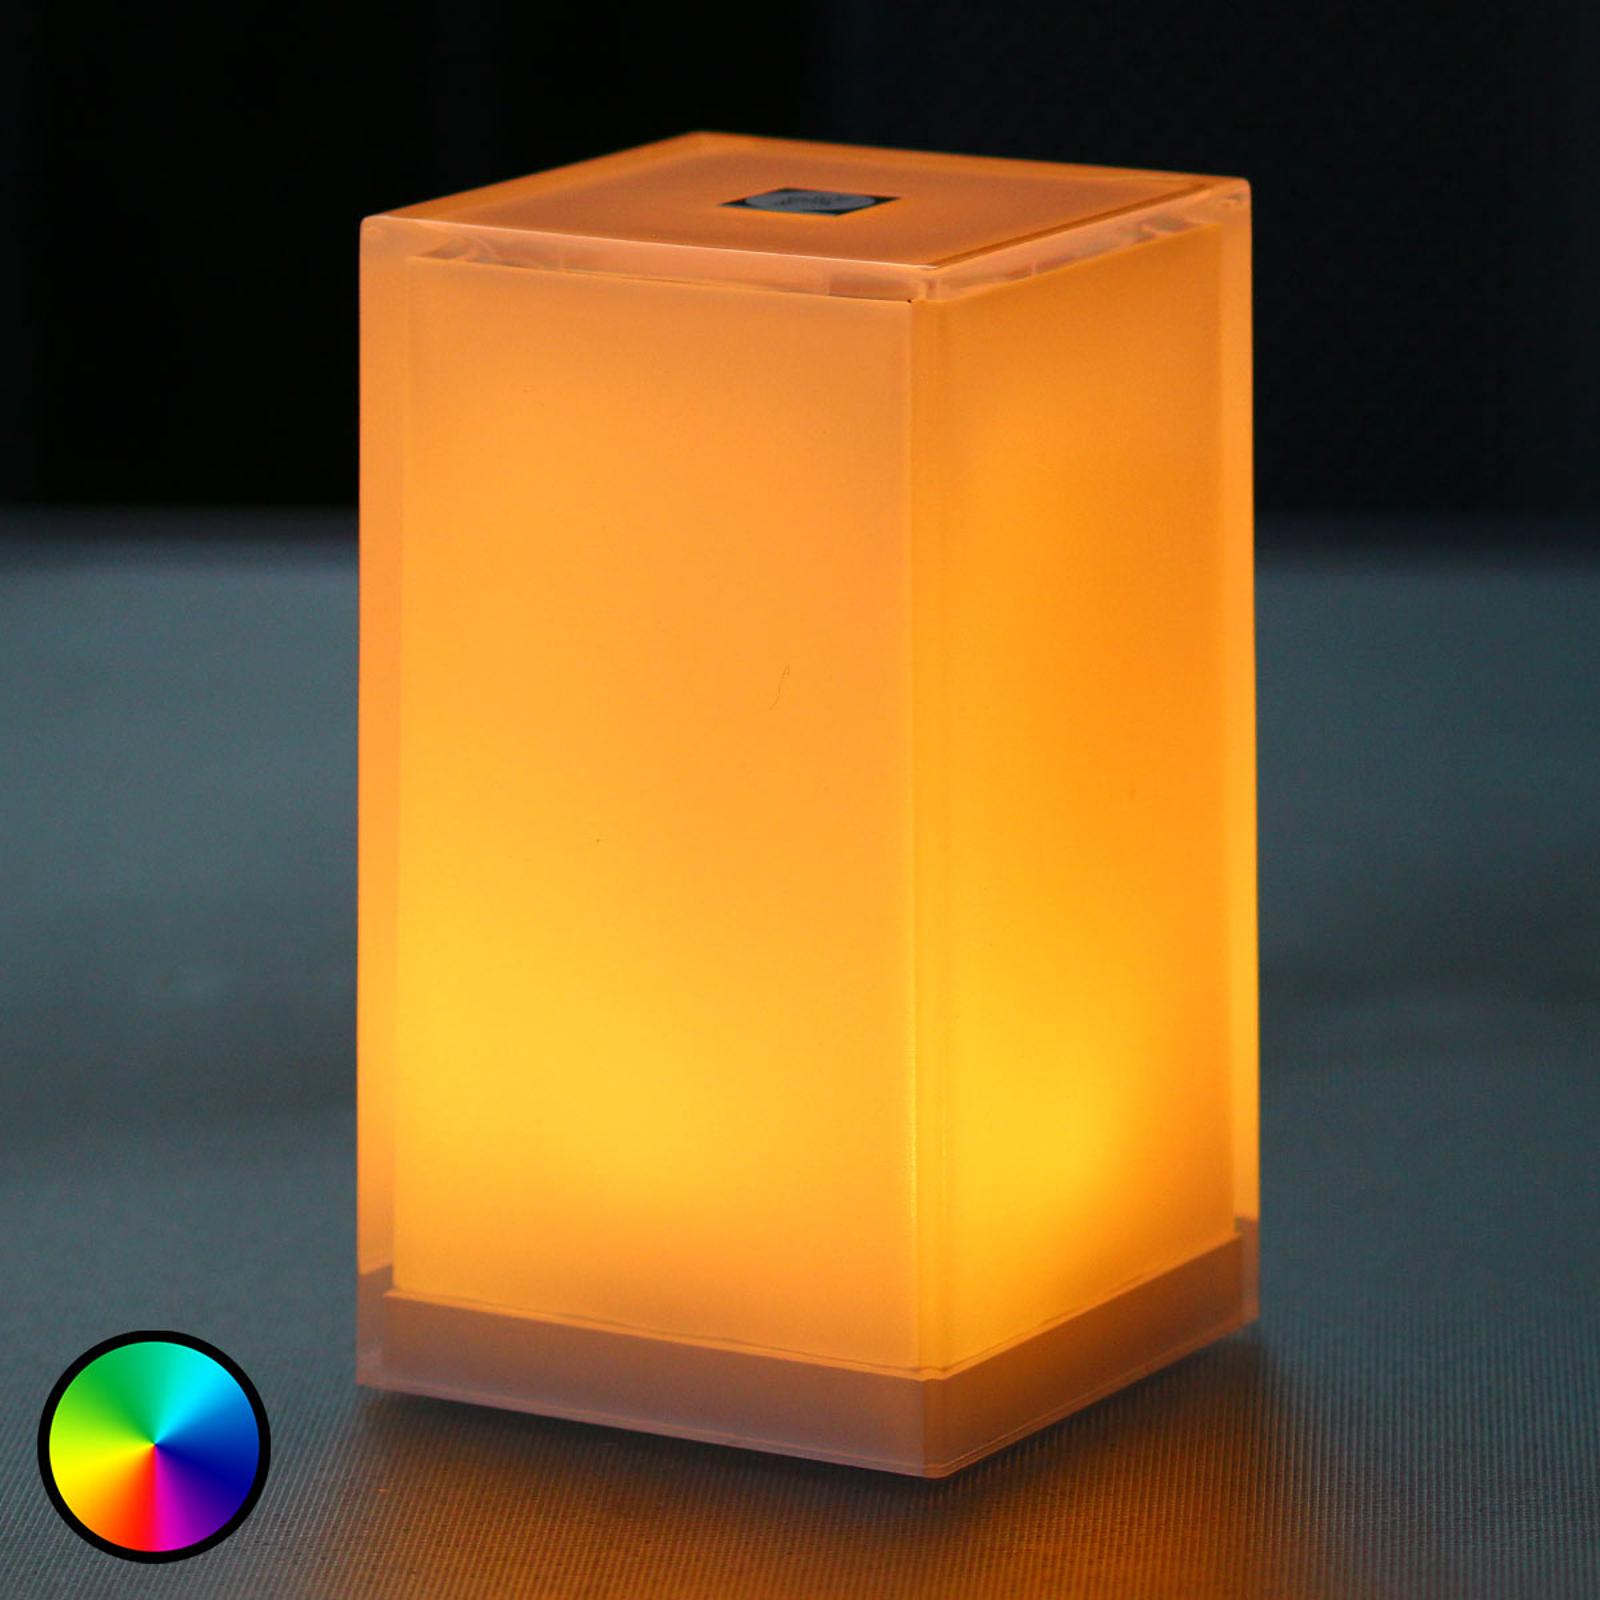 Portable tafellamp Cub, app-bestuurbaar, RGBW